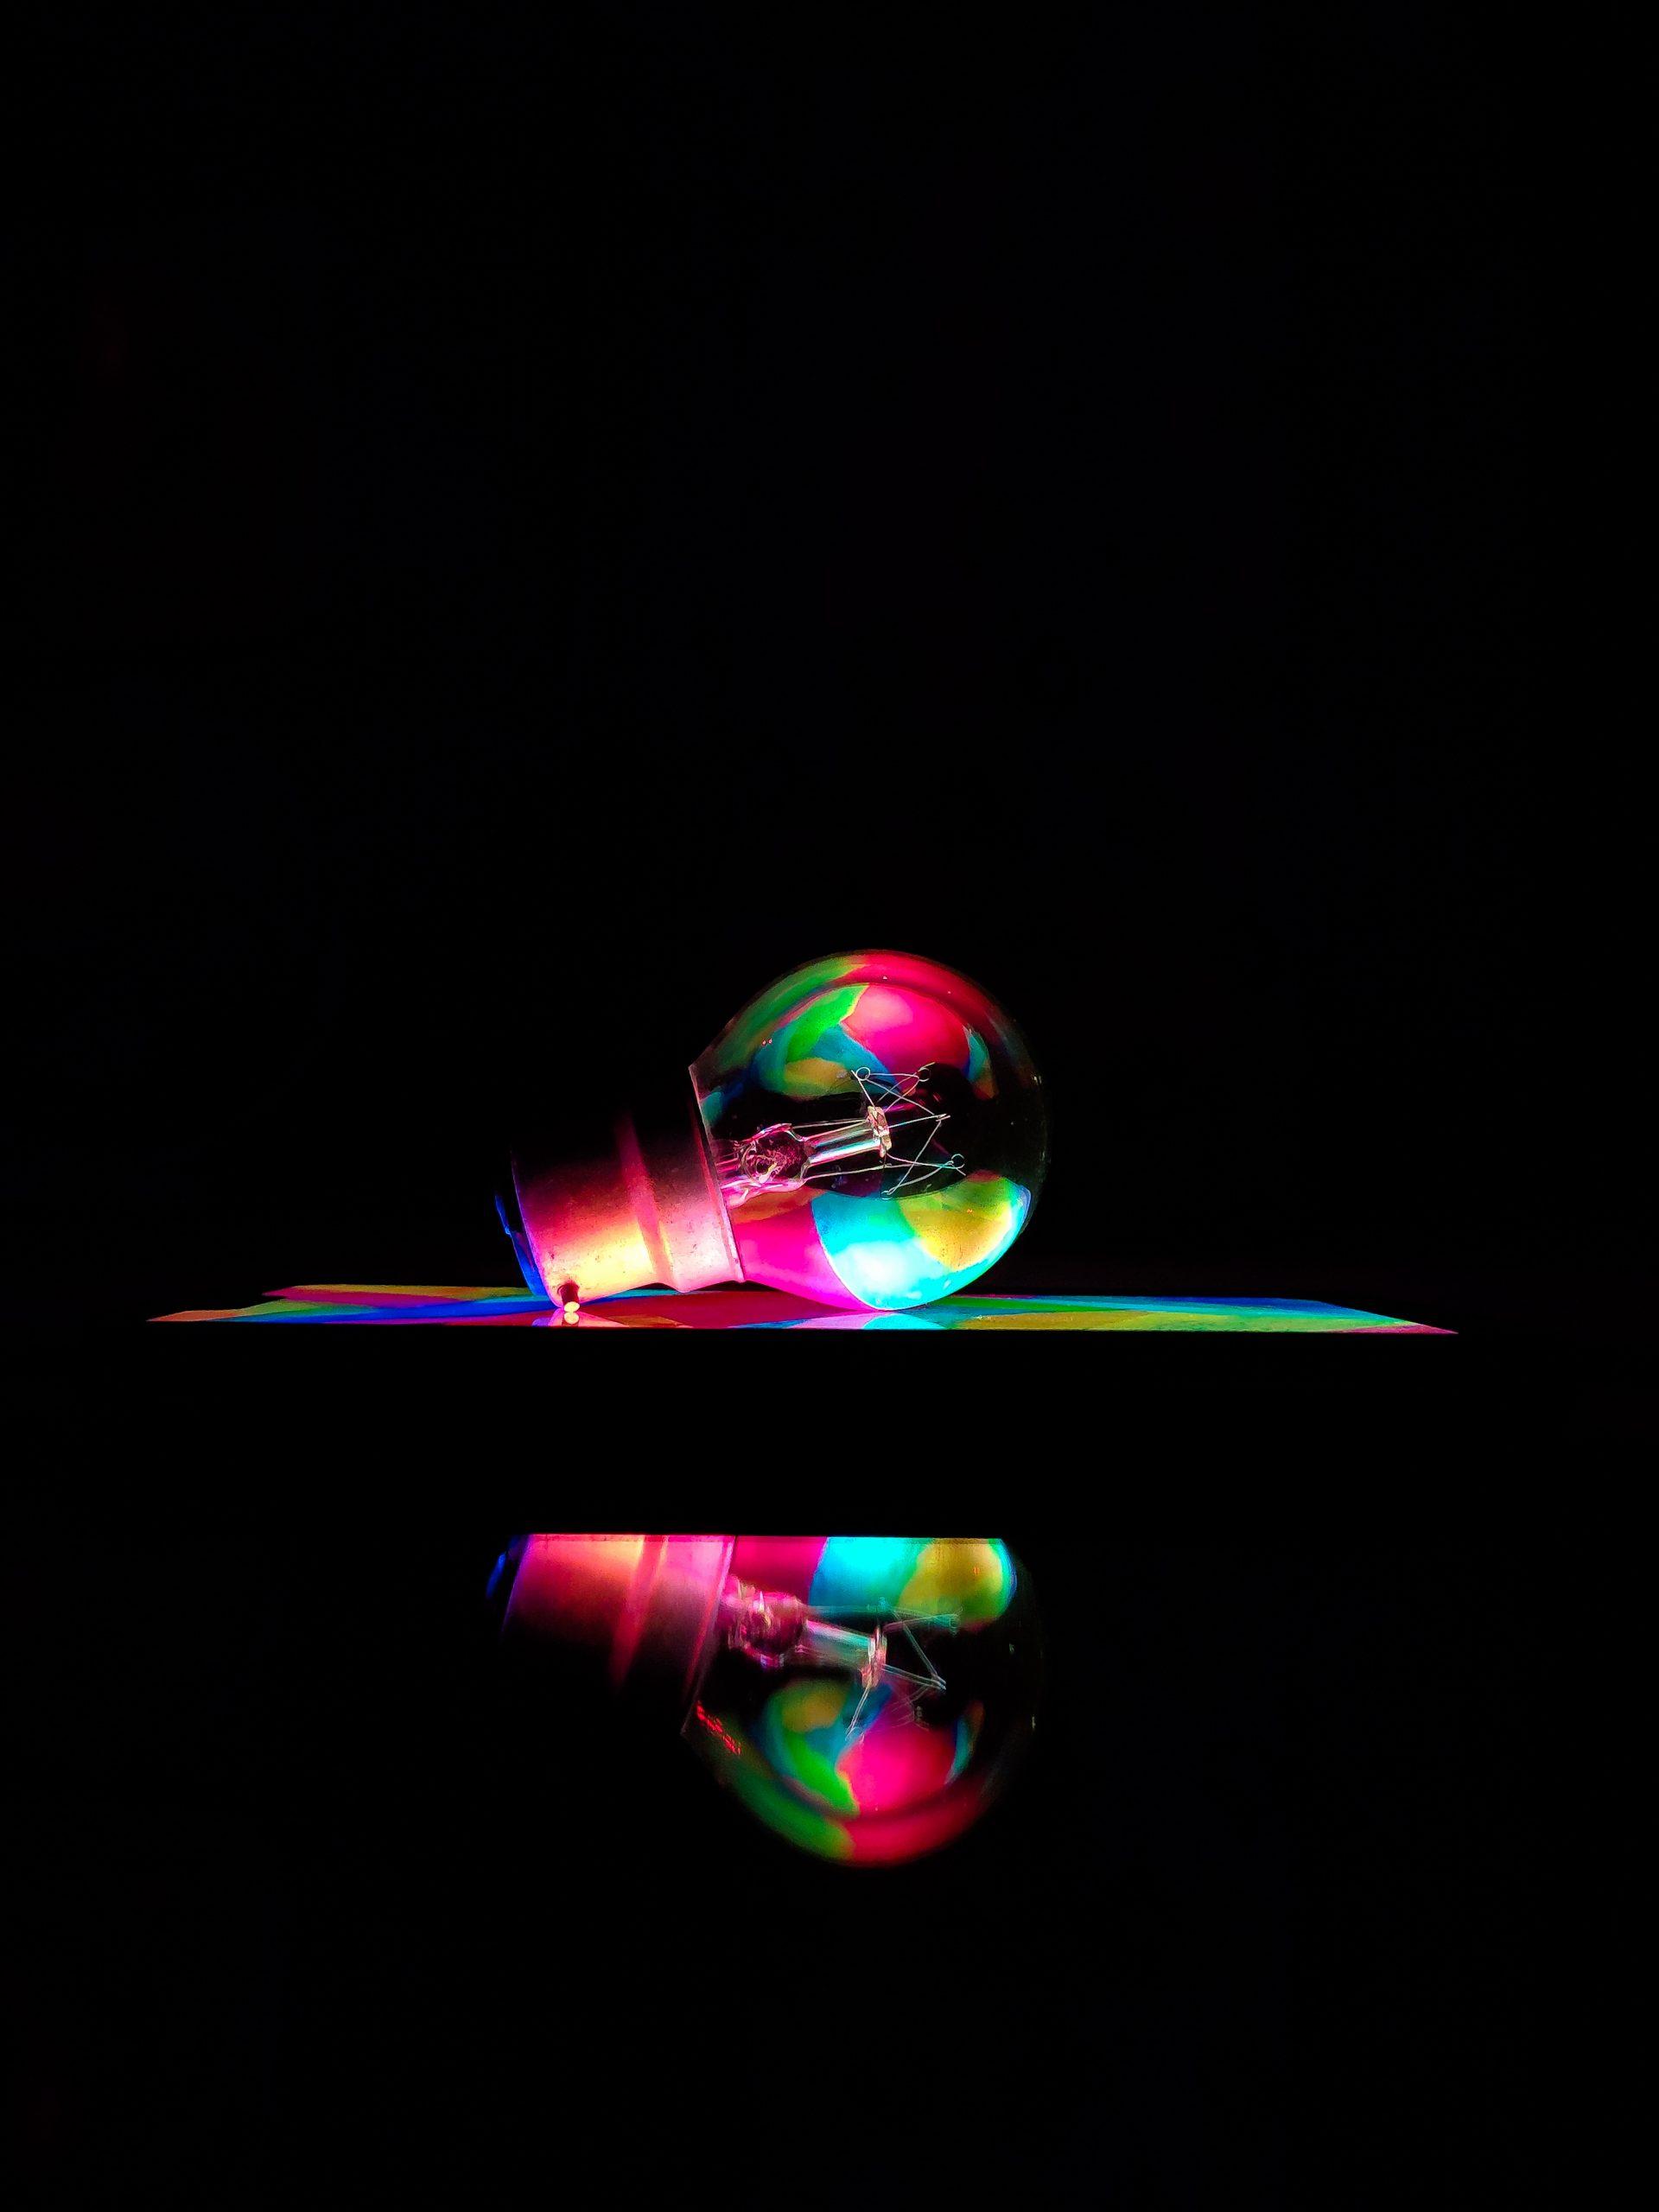 Reflection of a light bulb